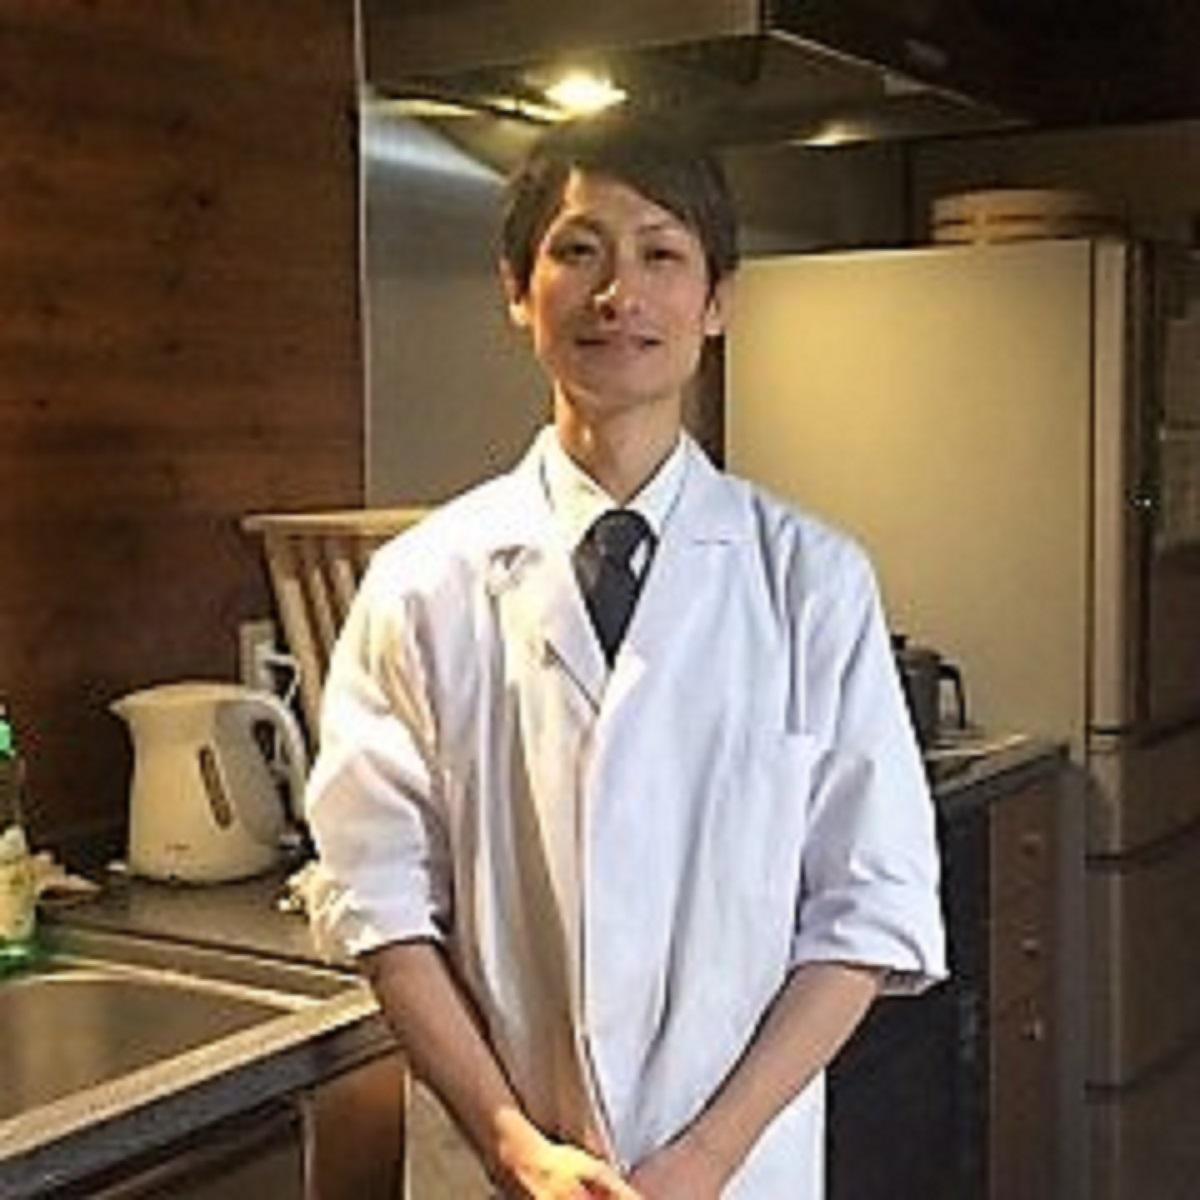 Professional Chef Class